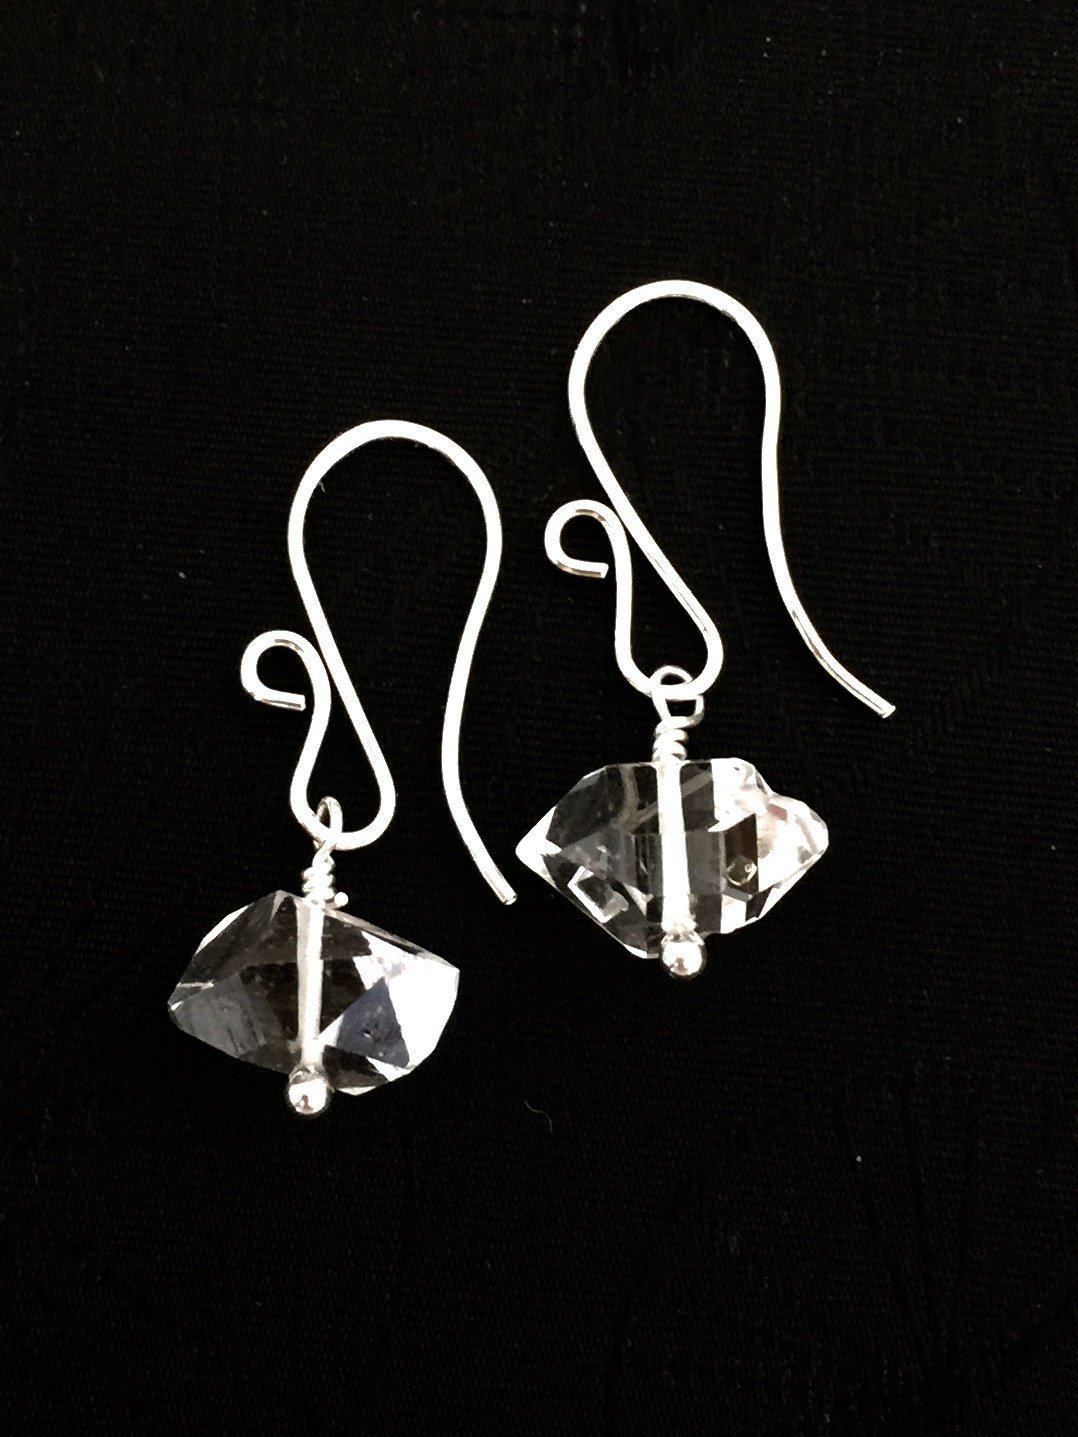 Gold Vermeil Drop Earrings Statement Earrings April Birthstone Herkimer Diamond Earrings Party Earrings Round Earrings